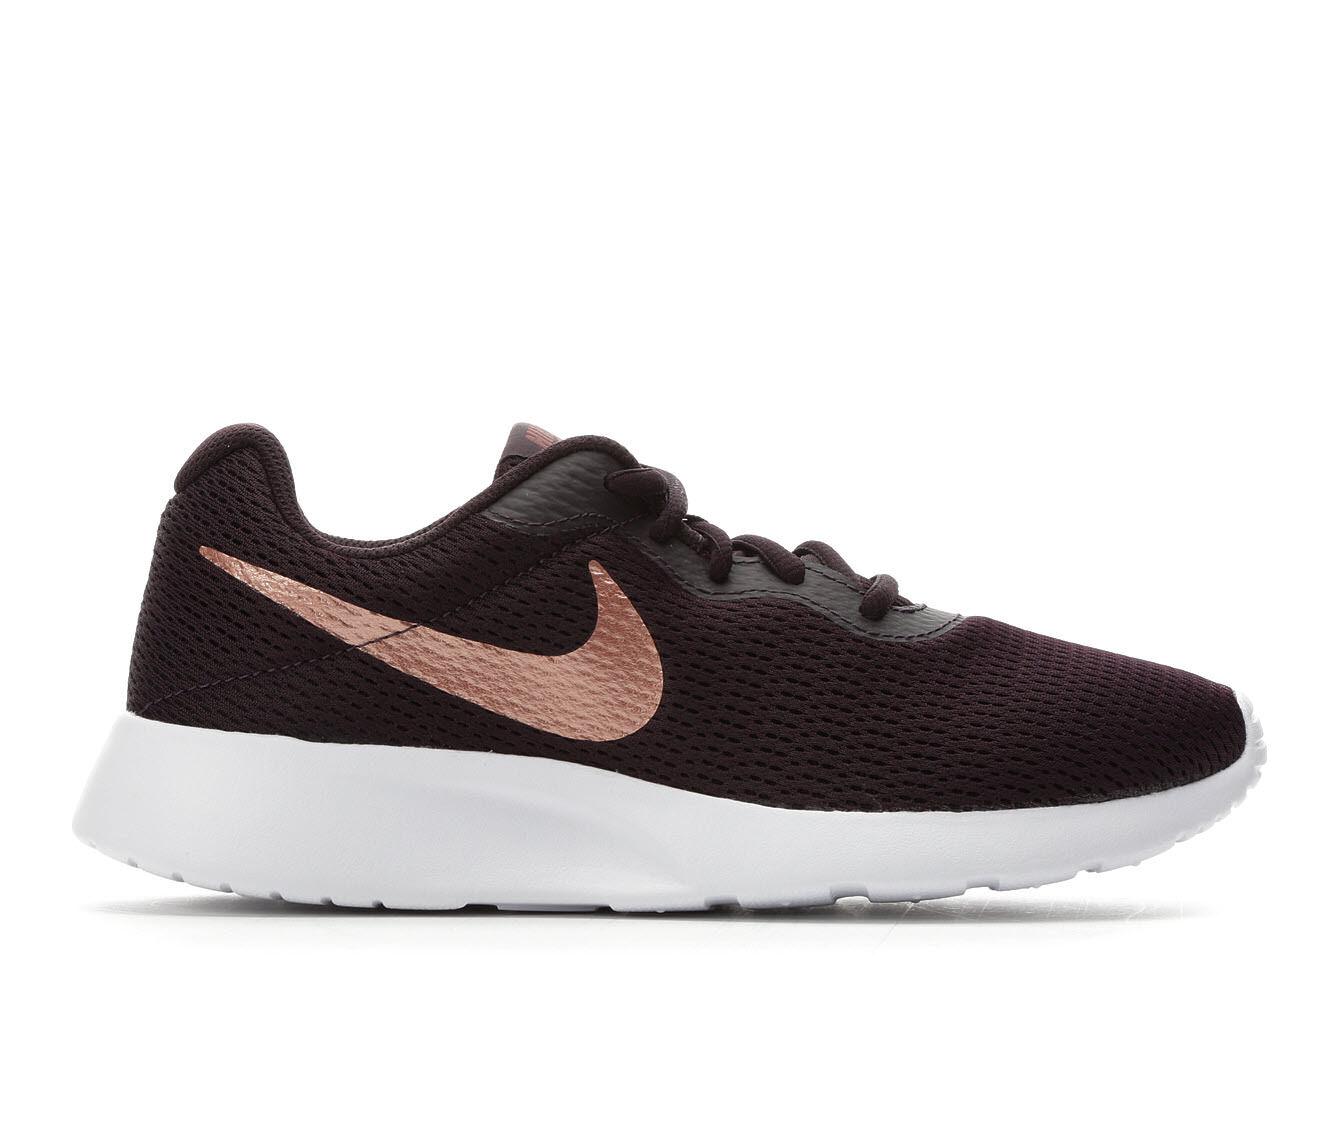 purchase cheap Women's Nike Tanjun Sneakers Burgundy/Bronze